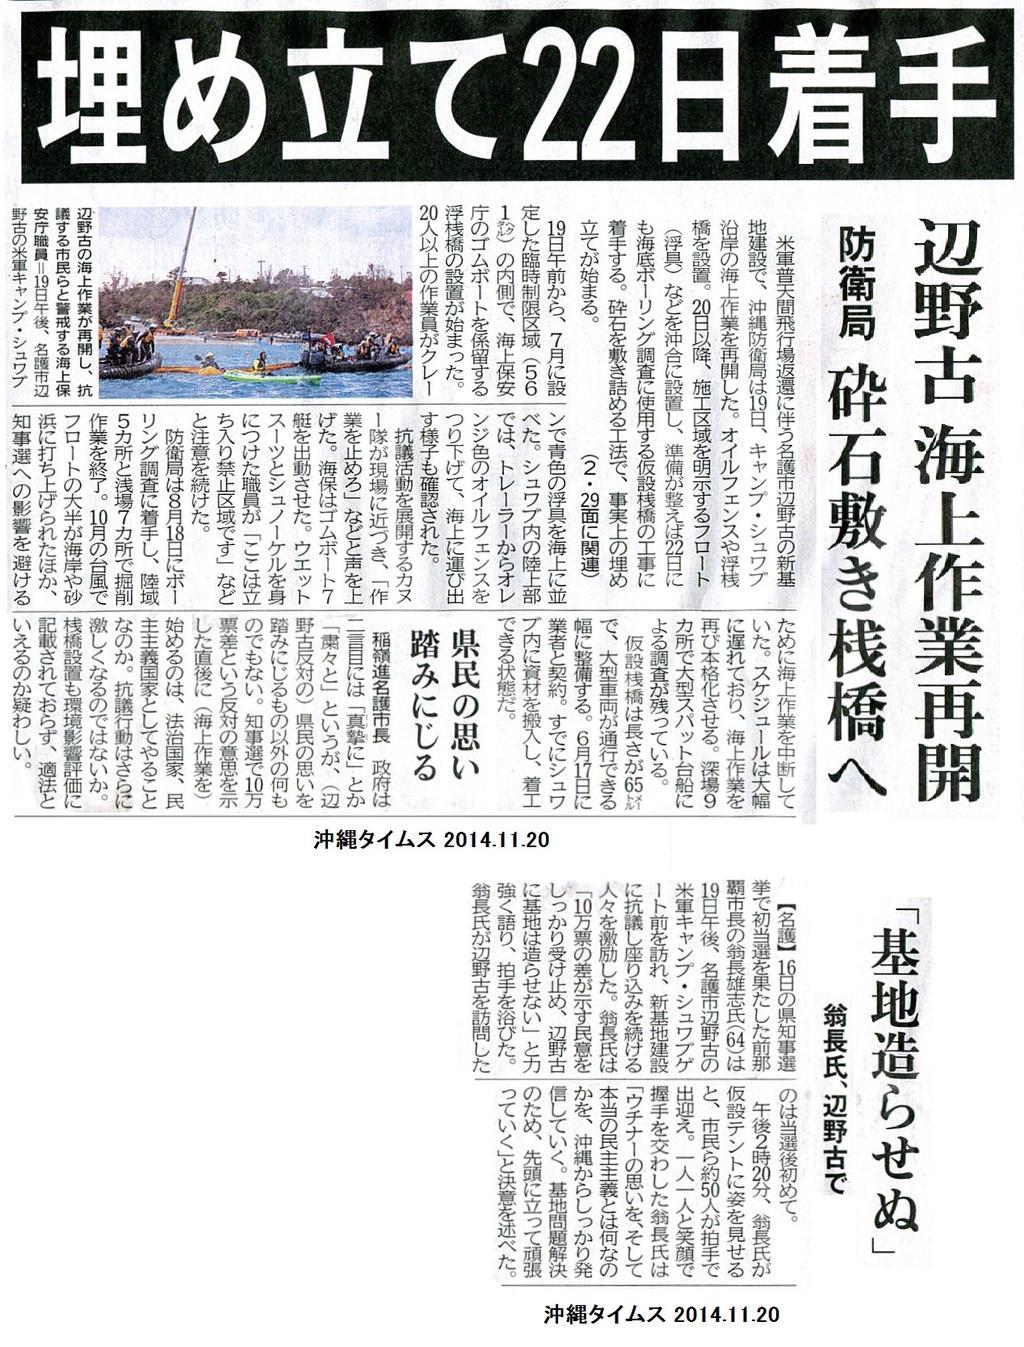 沖縄県警、新聞記者と映画監督を排除_f0212121_16343922.jpg